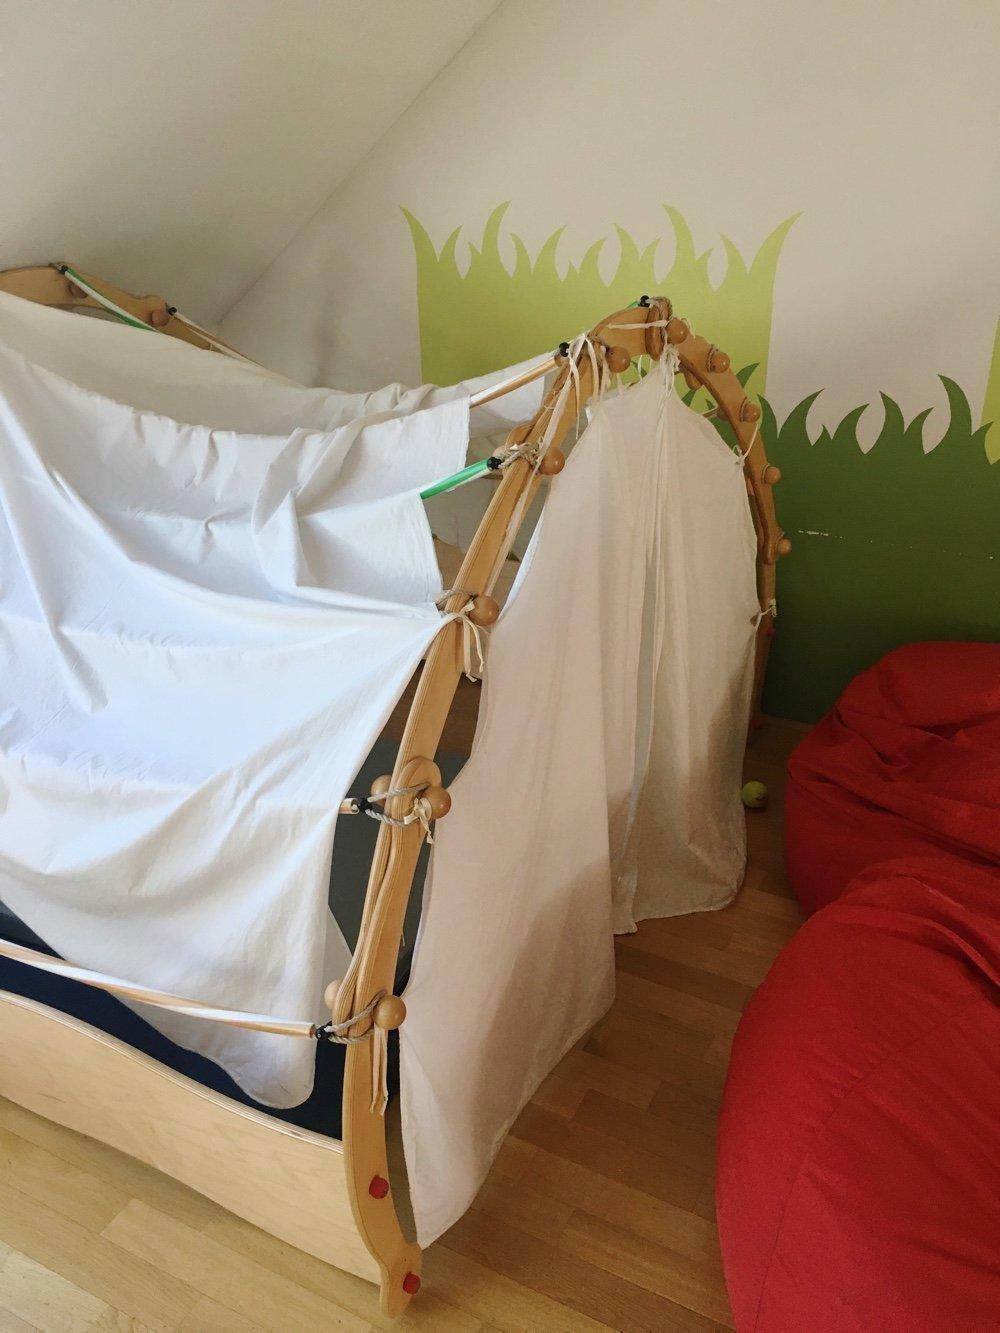 ronald-mcdonald-kinderhilfehaus-die kleine botin-5